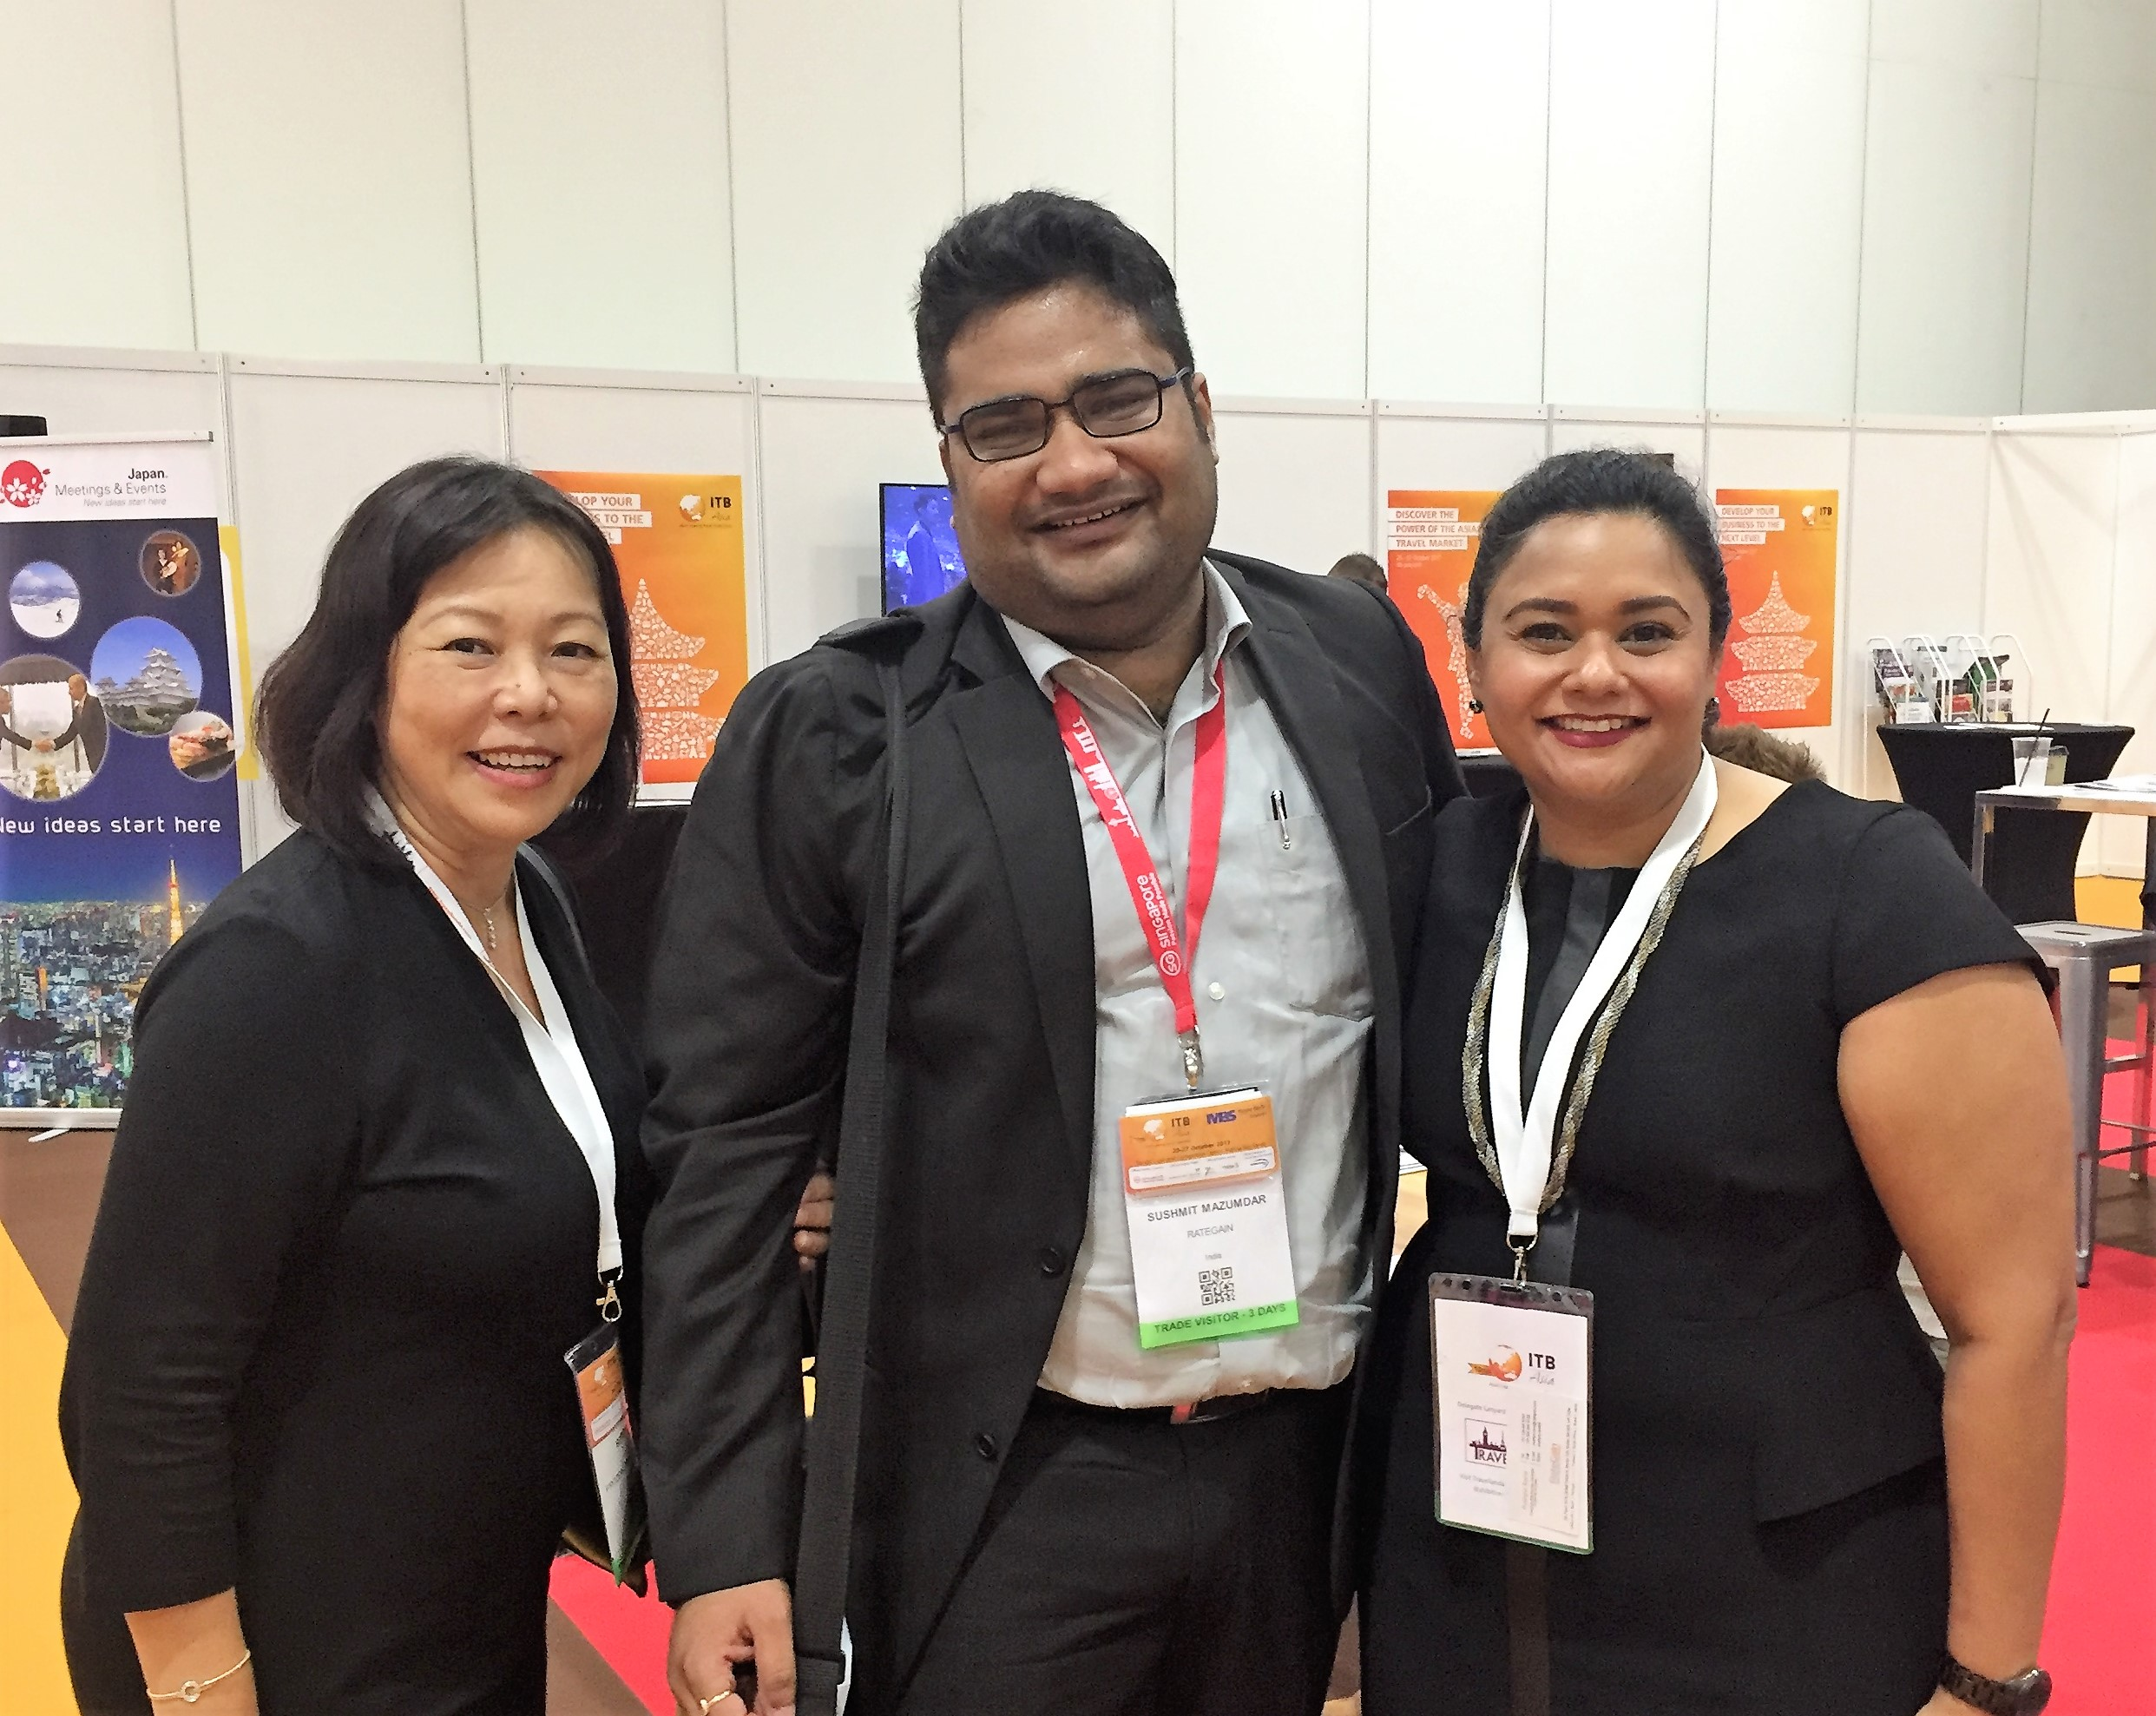 From left to right:  Ms Serene Law (VP, FLA), Mr Sushmit Mazumdar (RateGain), Ms Jagdish Sandhu (CEO, FLA).